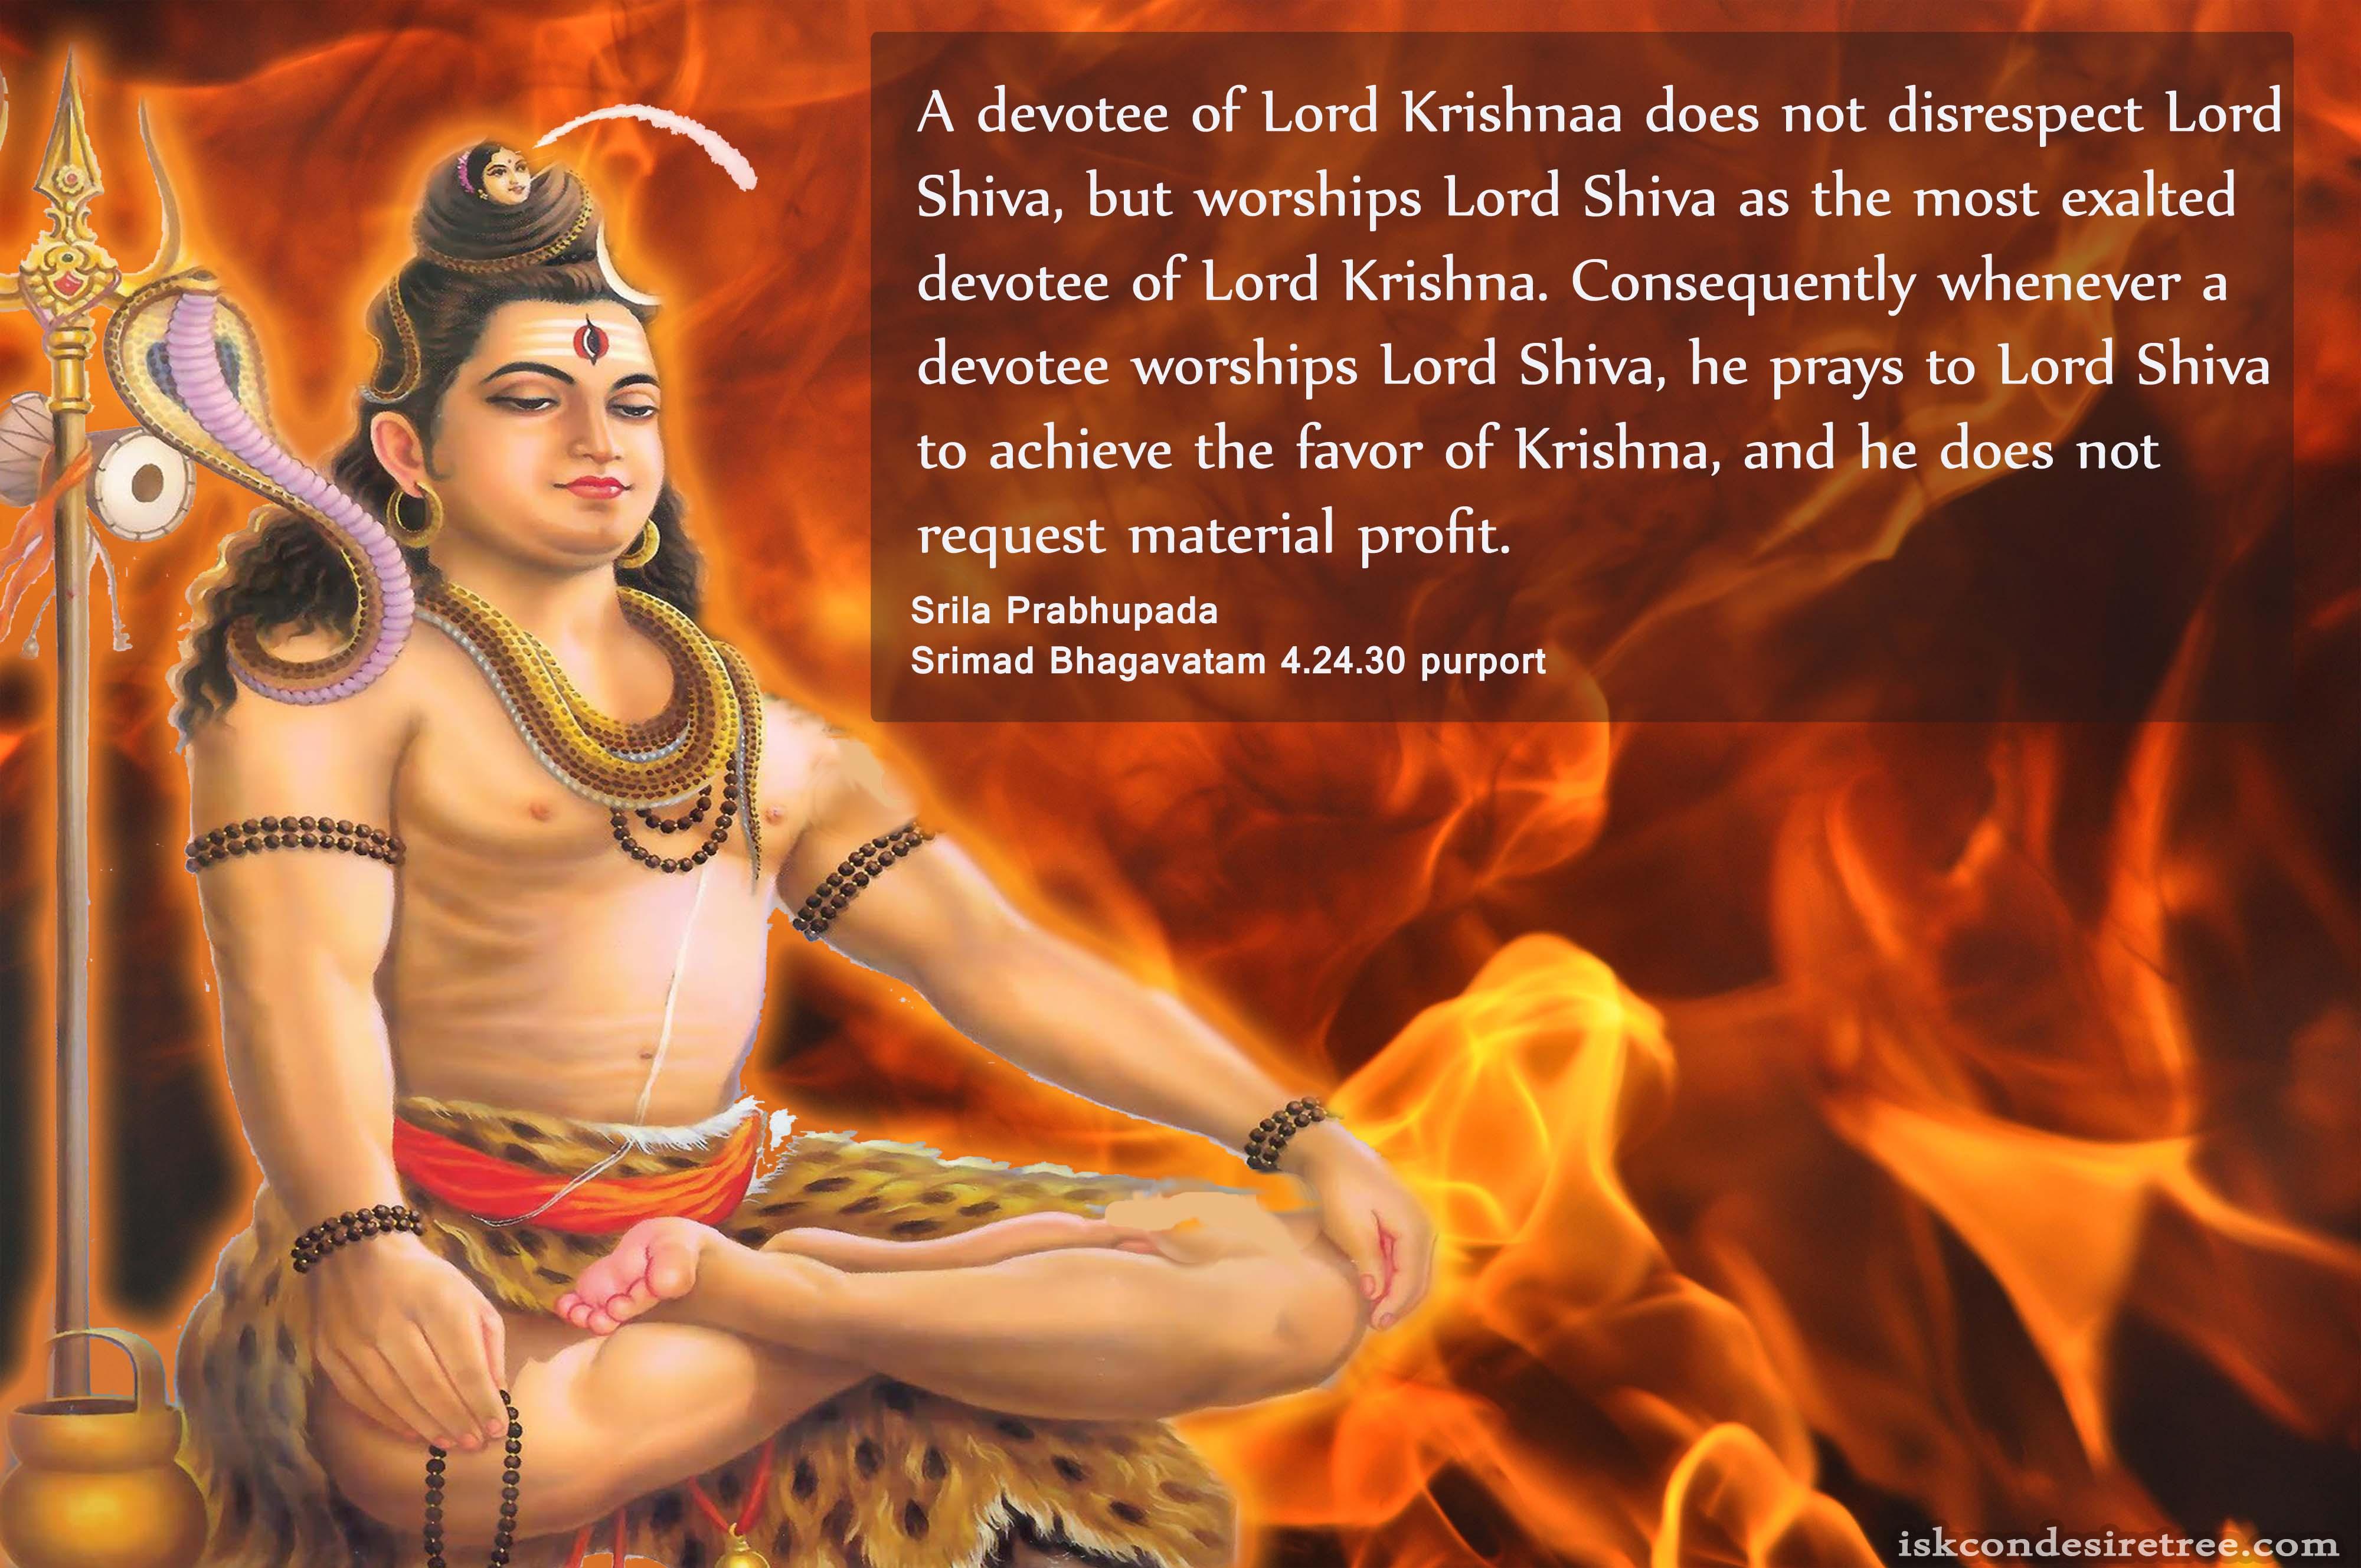 Lord Shiva Exalted Devotee Of Krishna